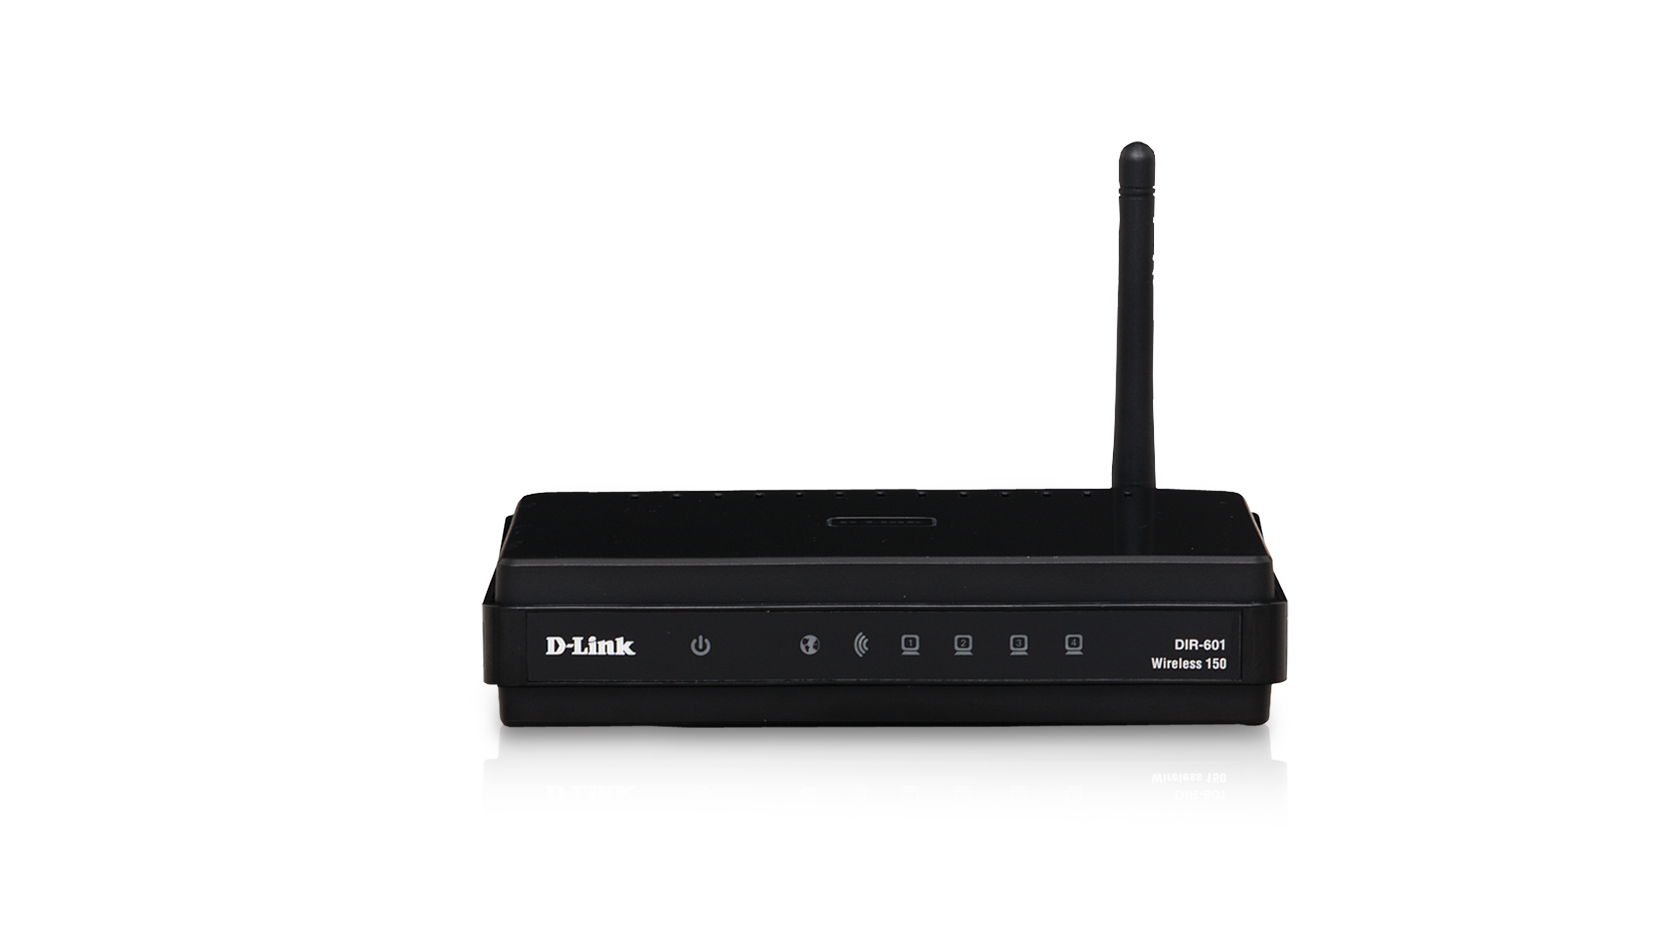 скачать драйвер d-link wireless n150